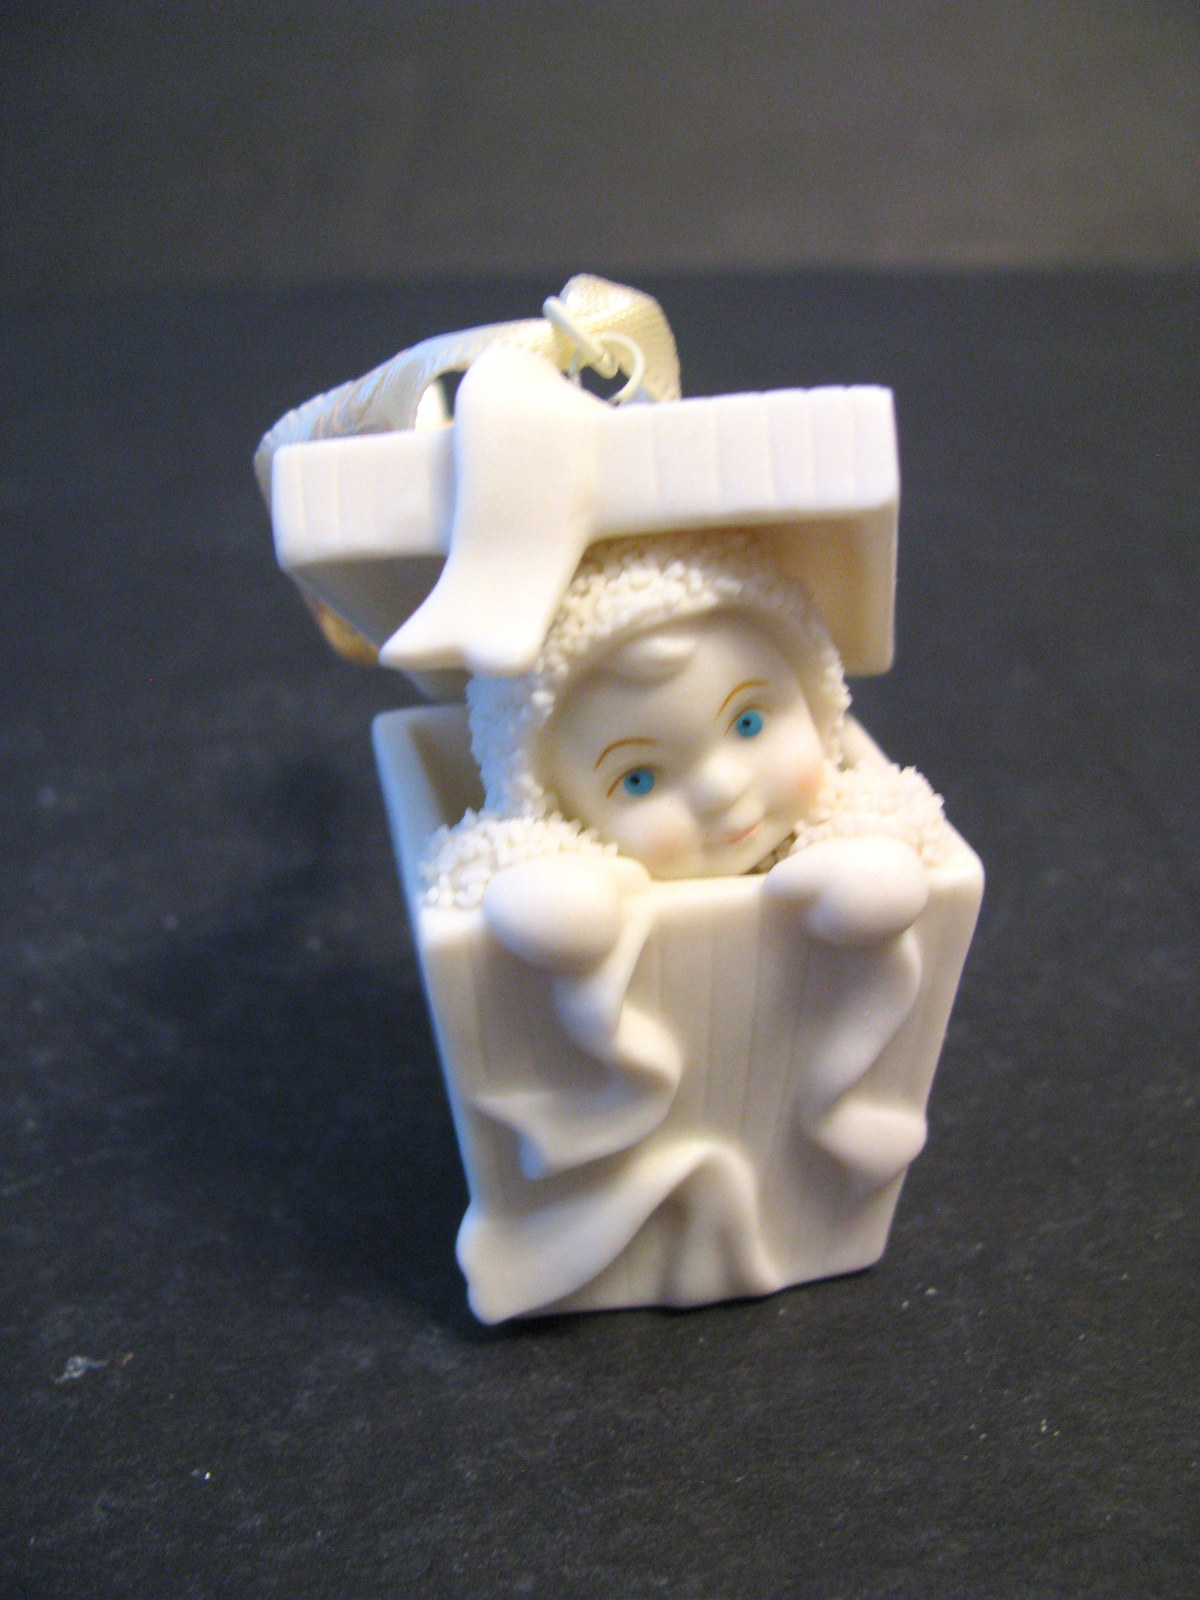 Department 56 snowbabies ornaments - Snowbabies Mini Department 56 Ornament Baby Gift 69535 9 99